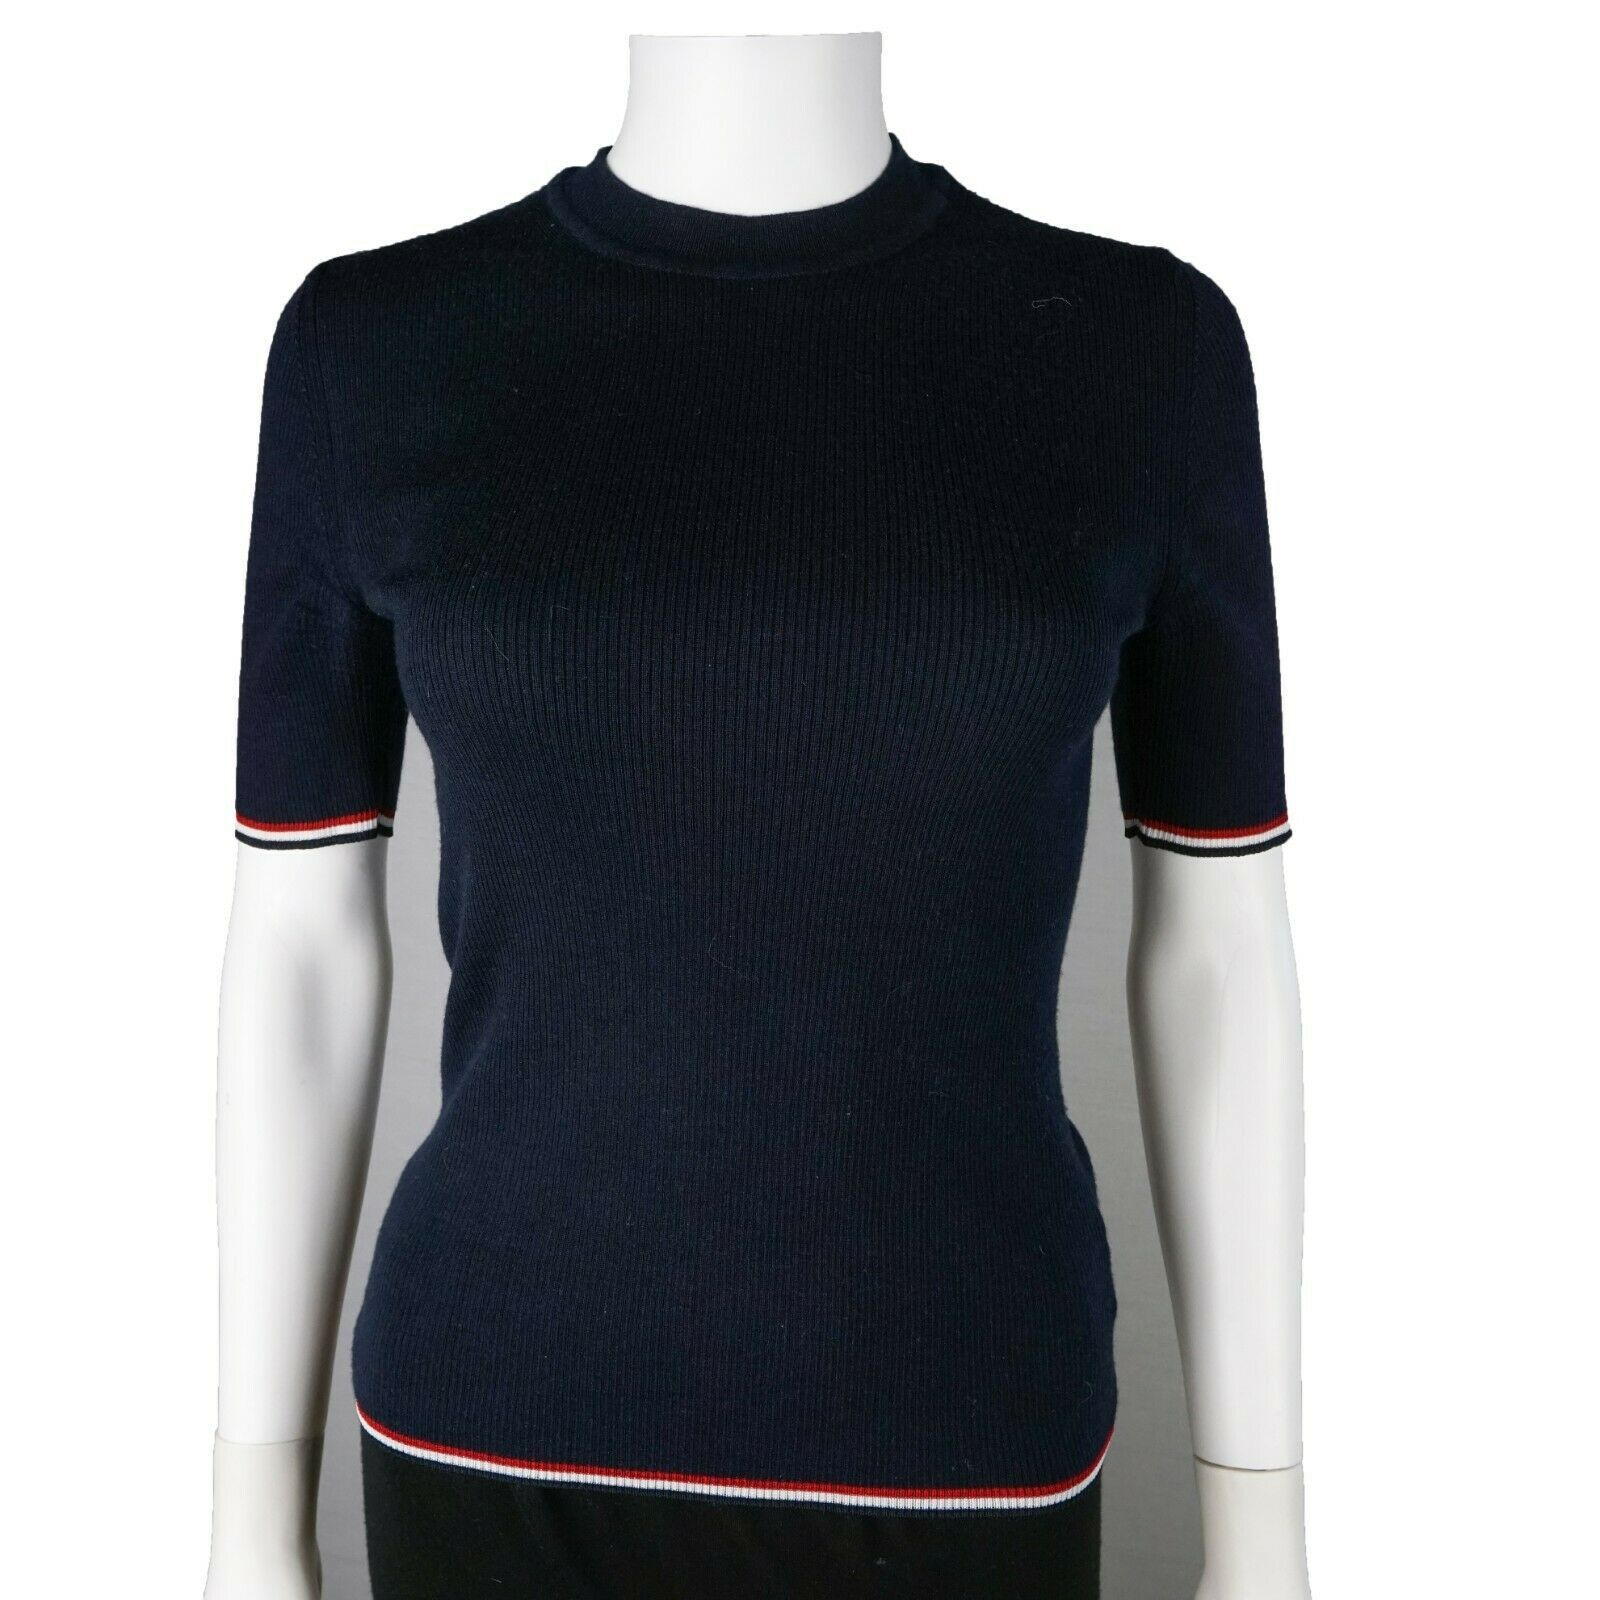 Woldorf USA Two Tone Rashguard in Black//Red Full Sleeve size L no logo